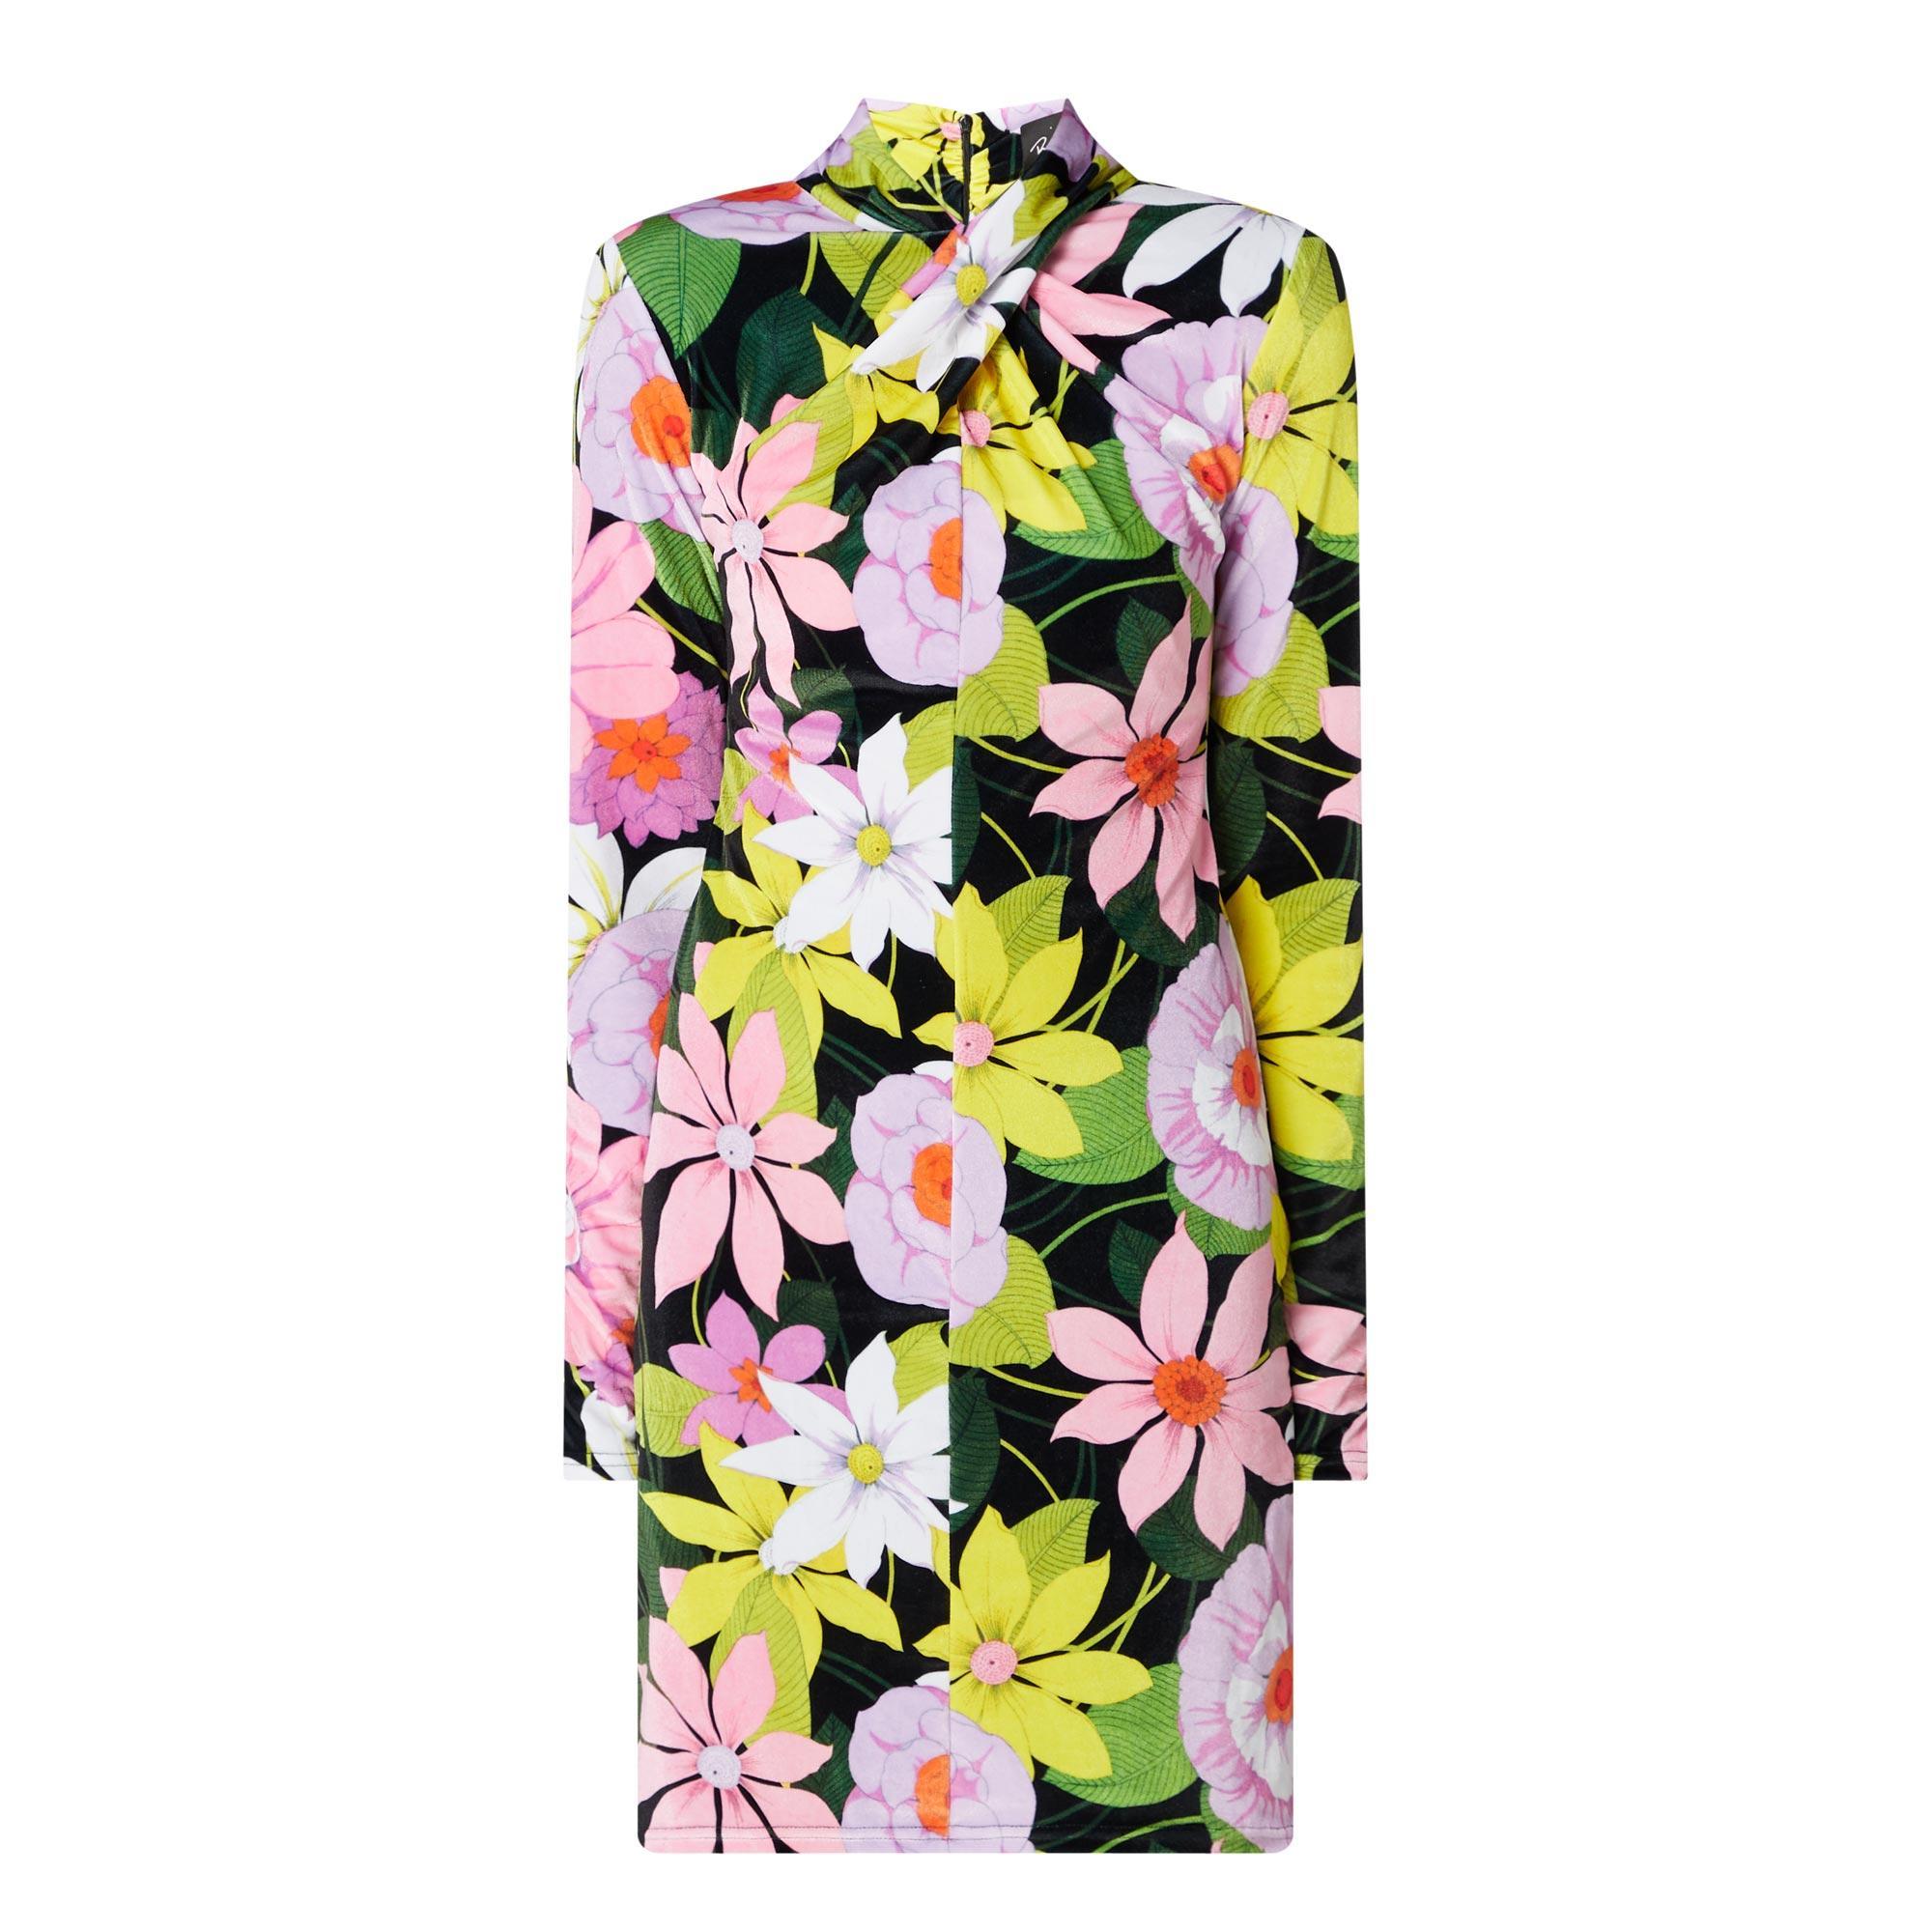 Daisy Print Long-Sleeved Dress